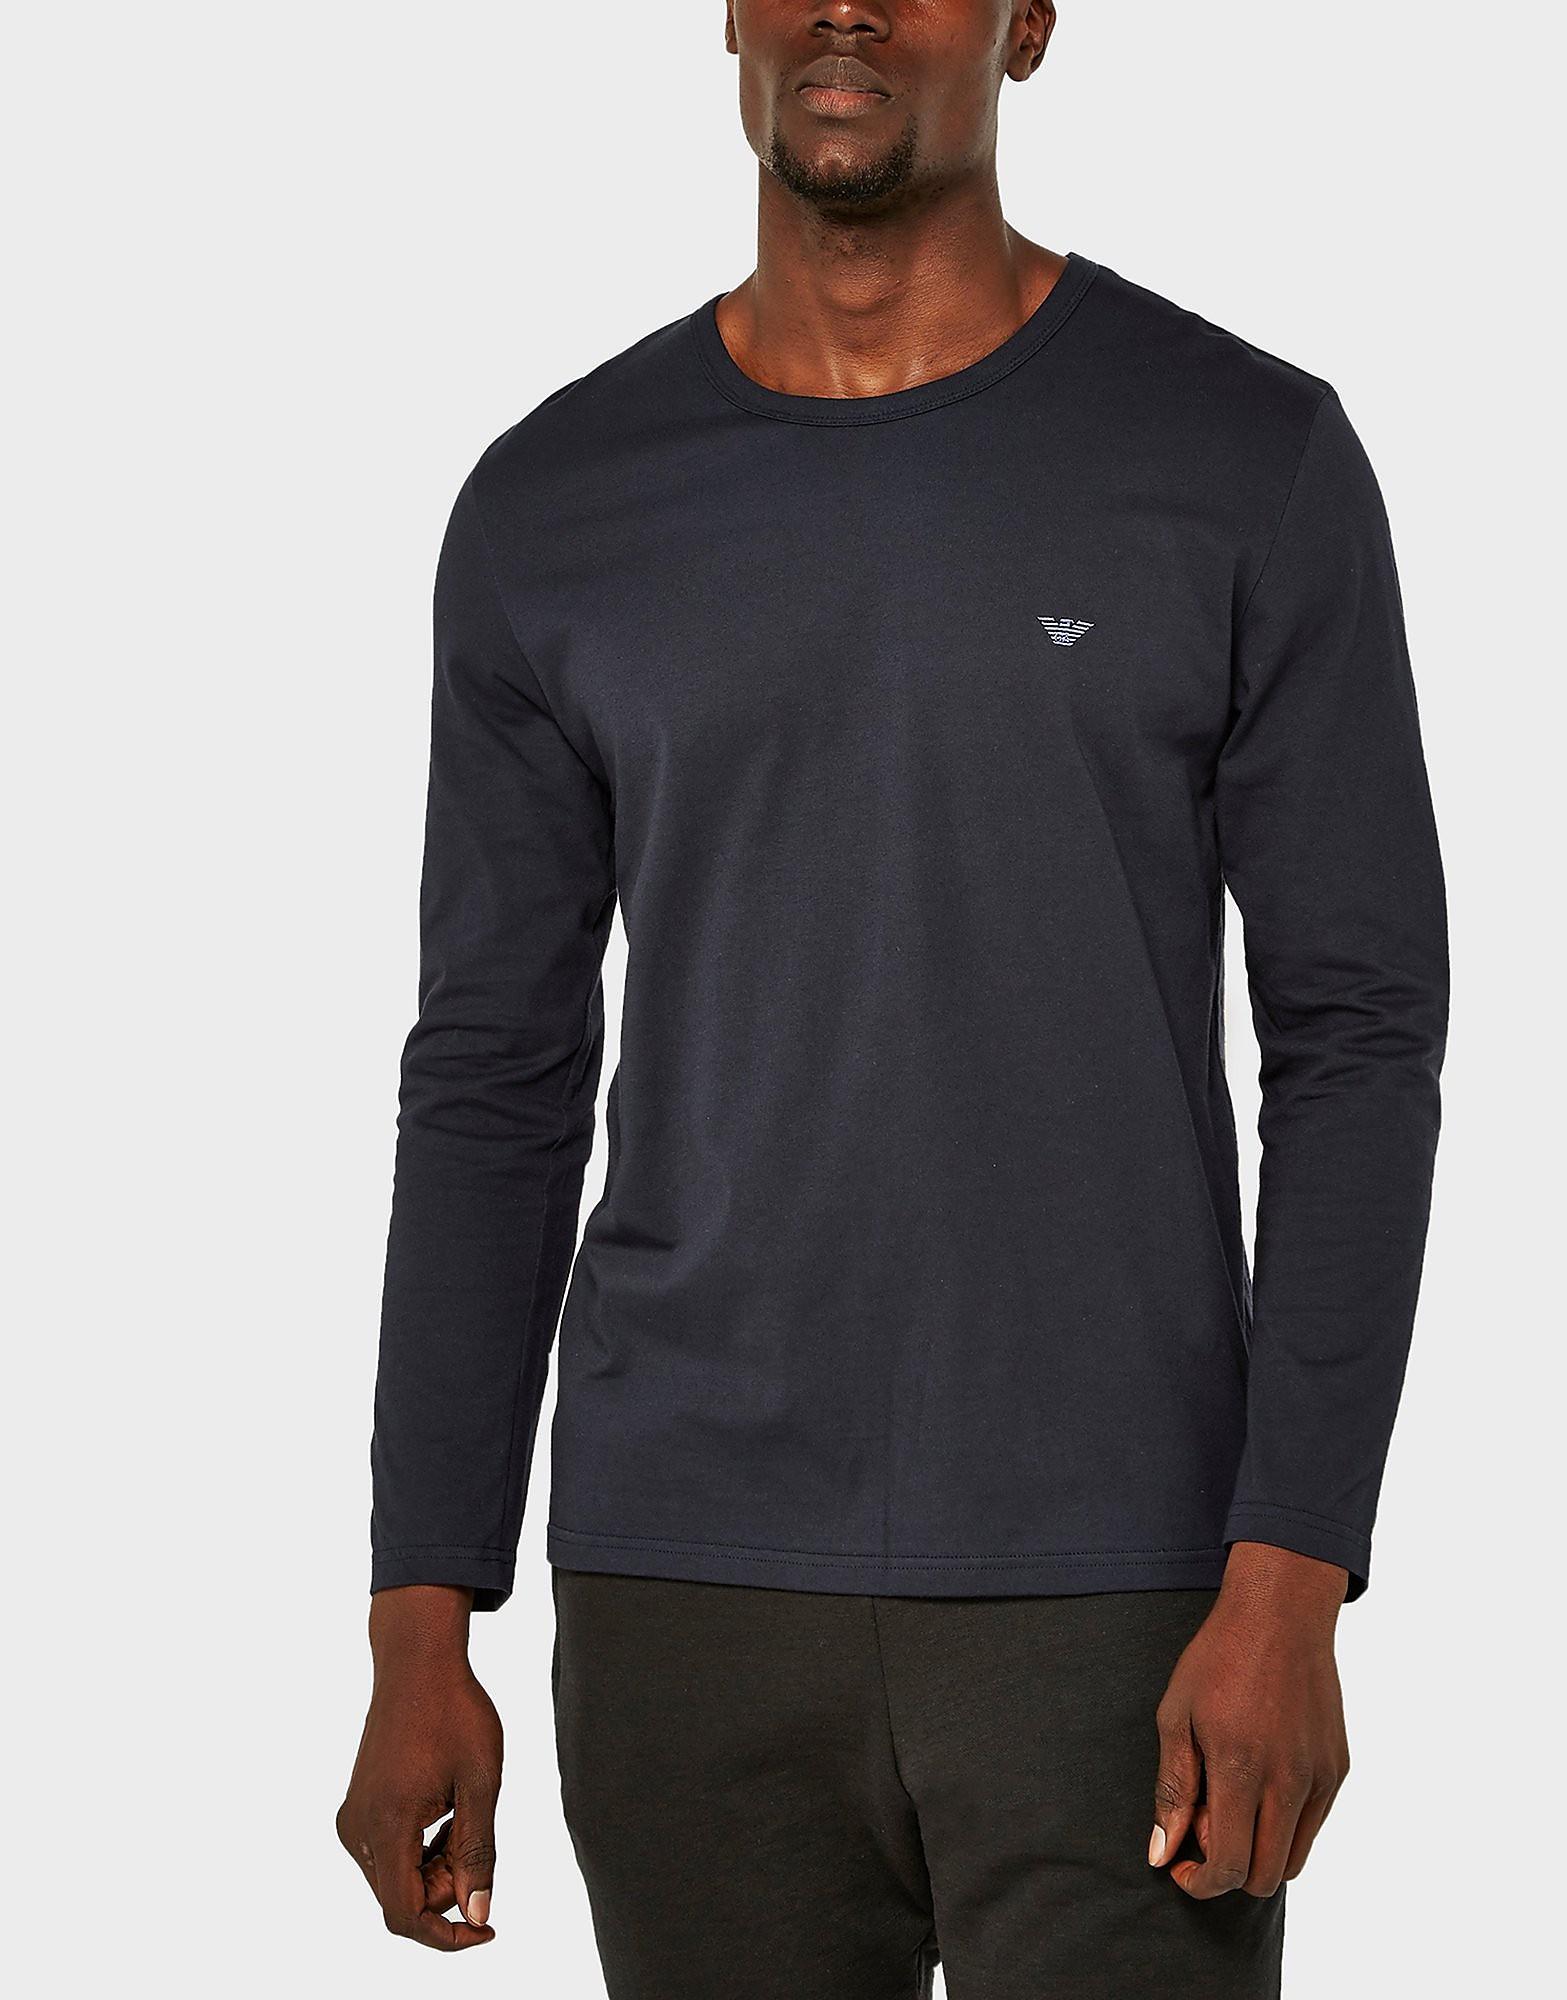 Emporio Armani Eagle Long Sleeve Crew T-Shirt